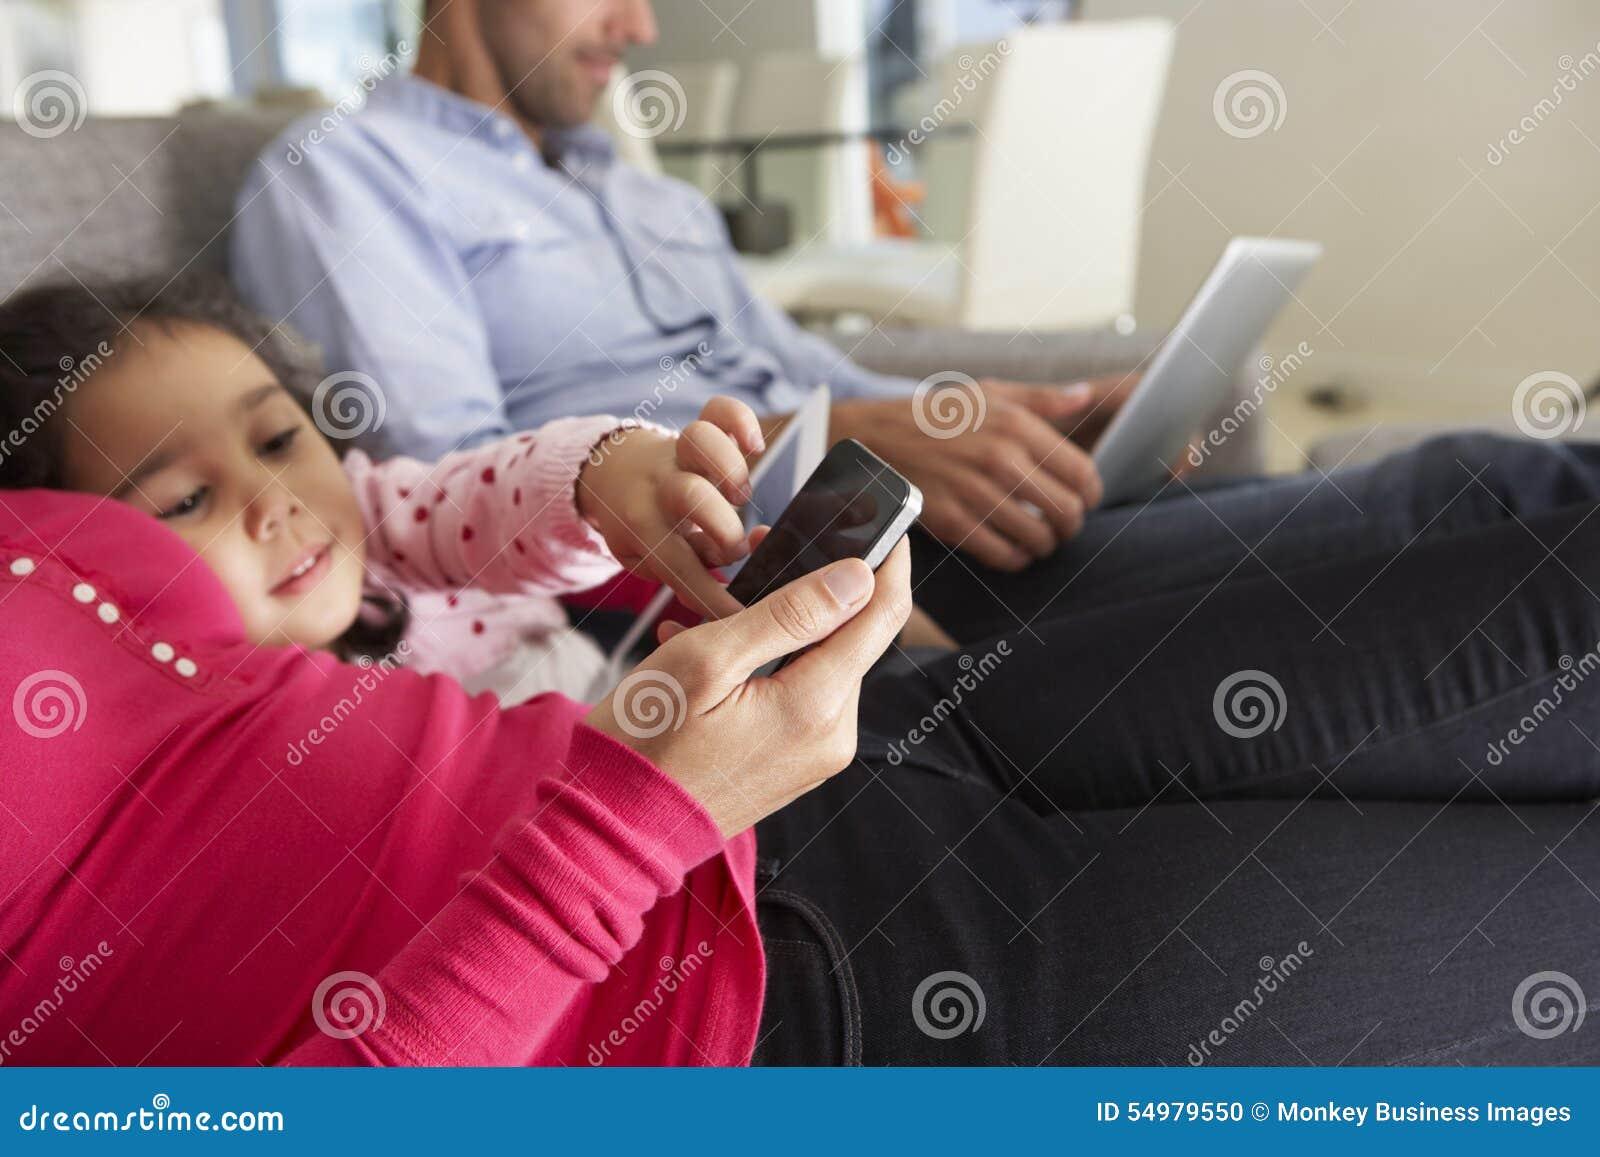 Familie auf Sofa With Smartphone, Laptop und Digital-Tablet